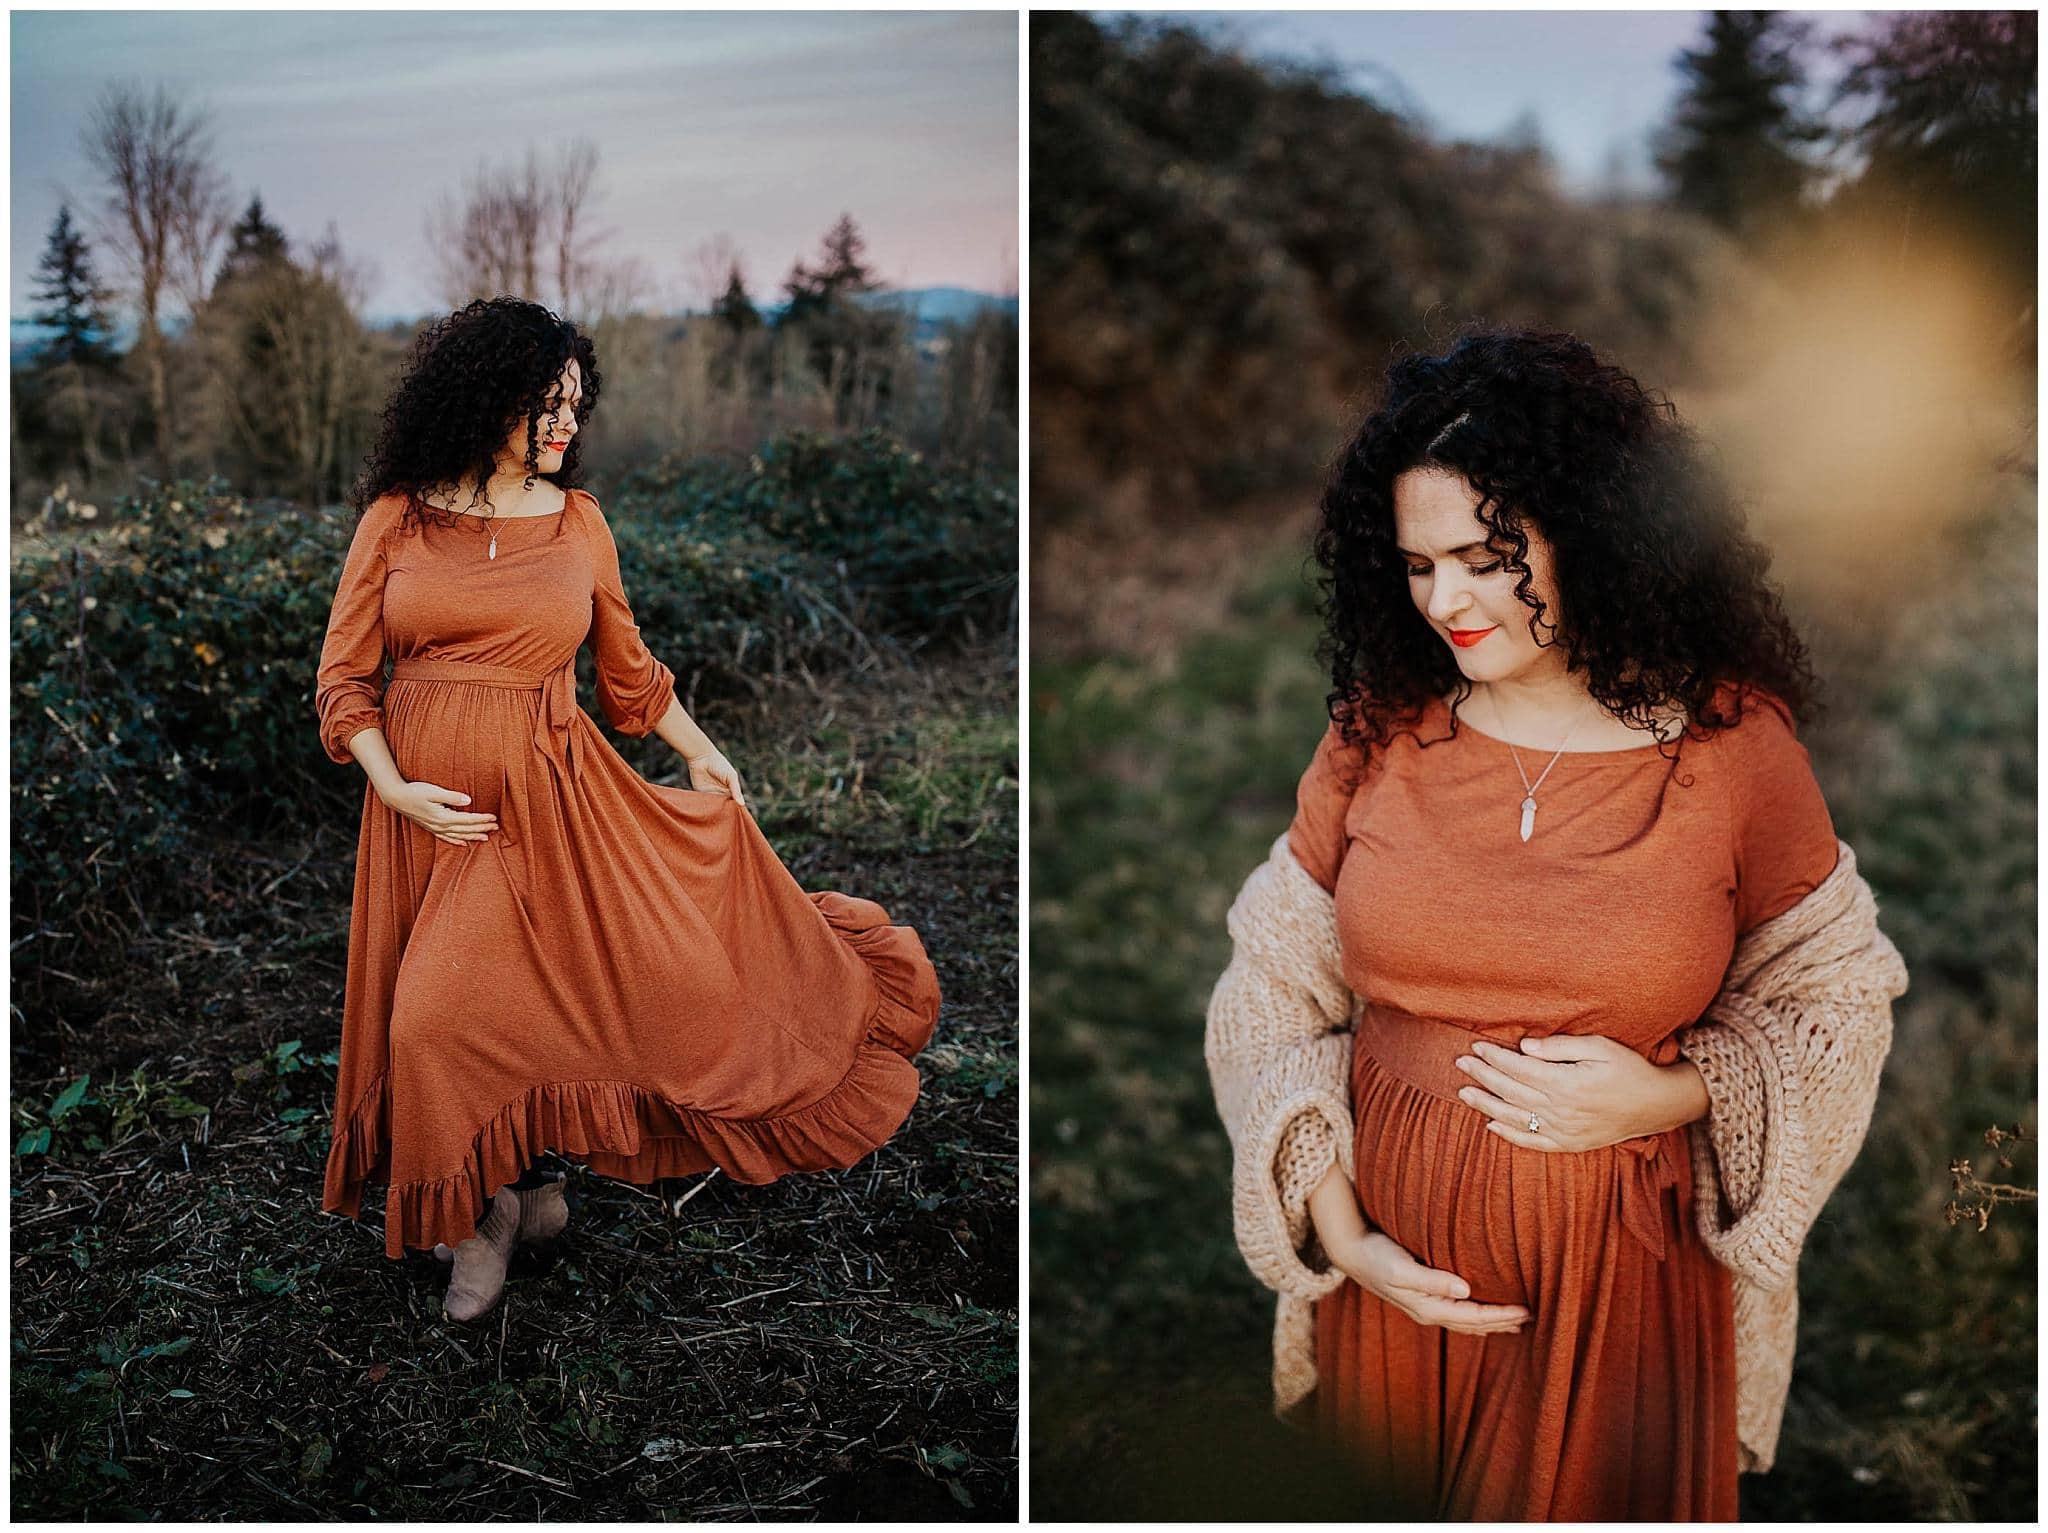 Pregnant woman in orange joyfolie dress